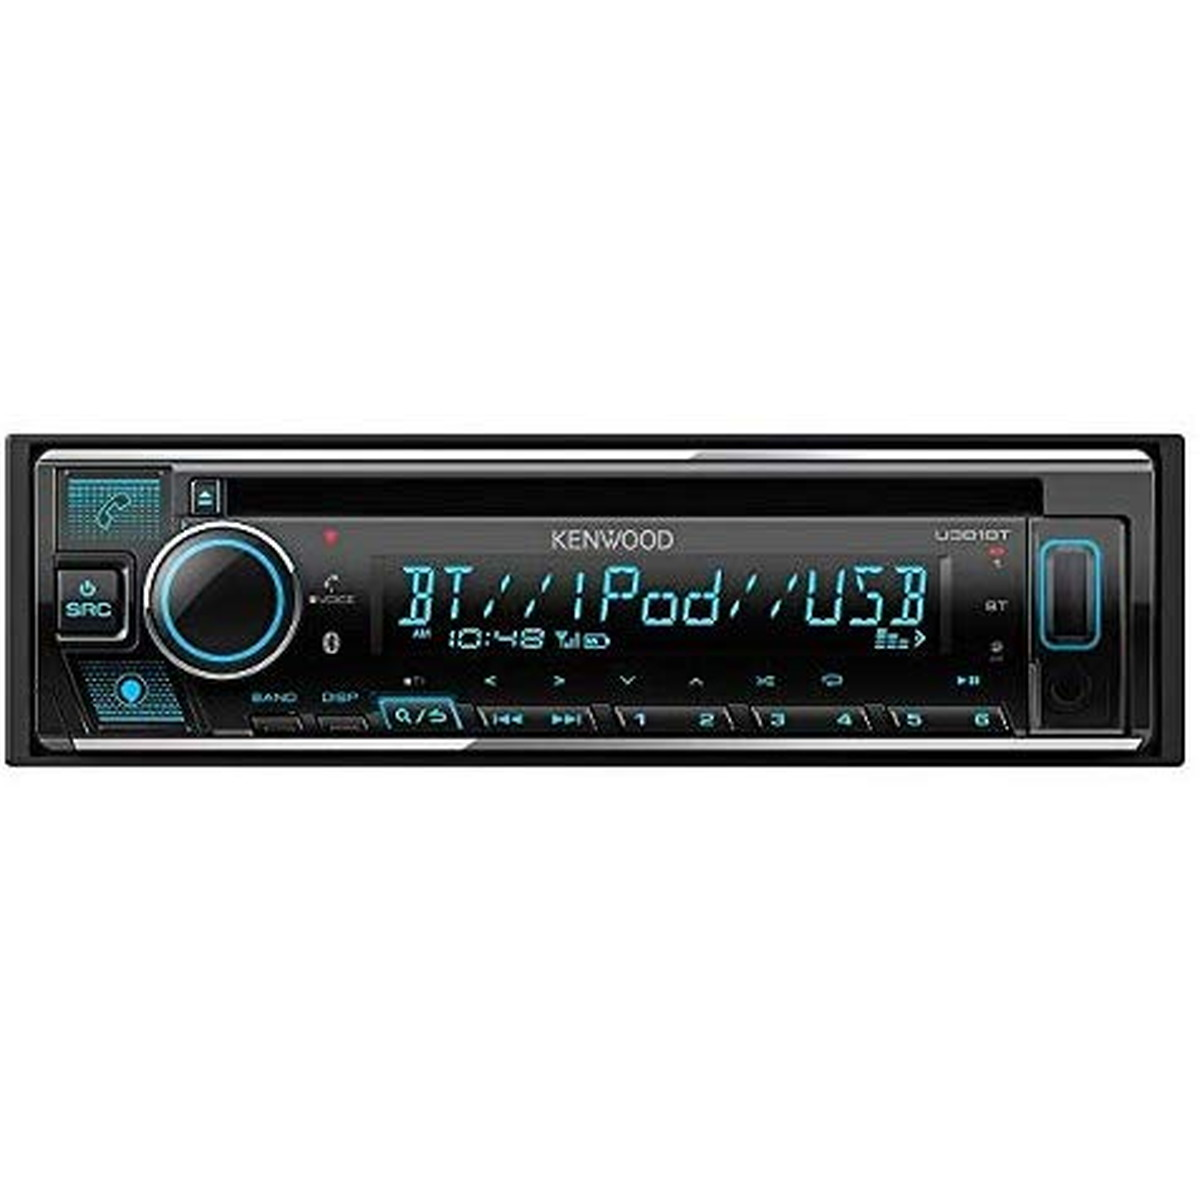 KENWOOD/ケンウッド Bluetooth Alexa 対応 バリアブルイルミ 1DINオーディオデッキ U381BT